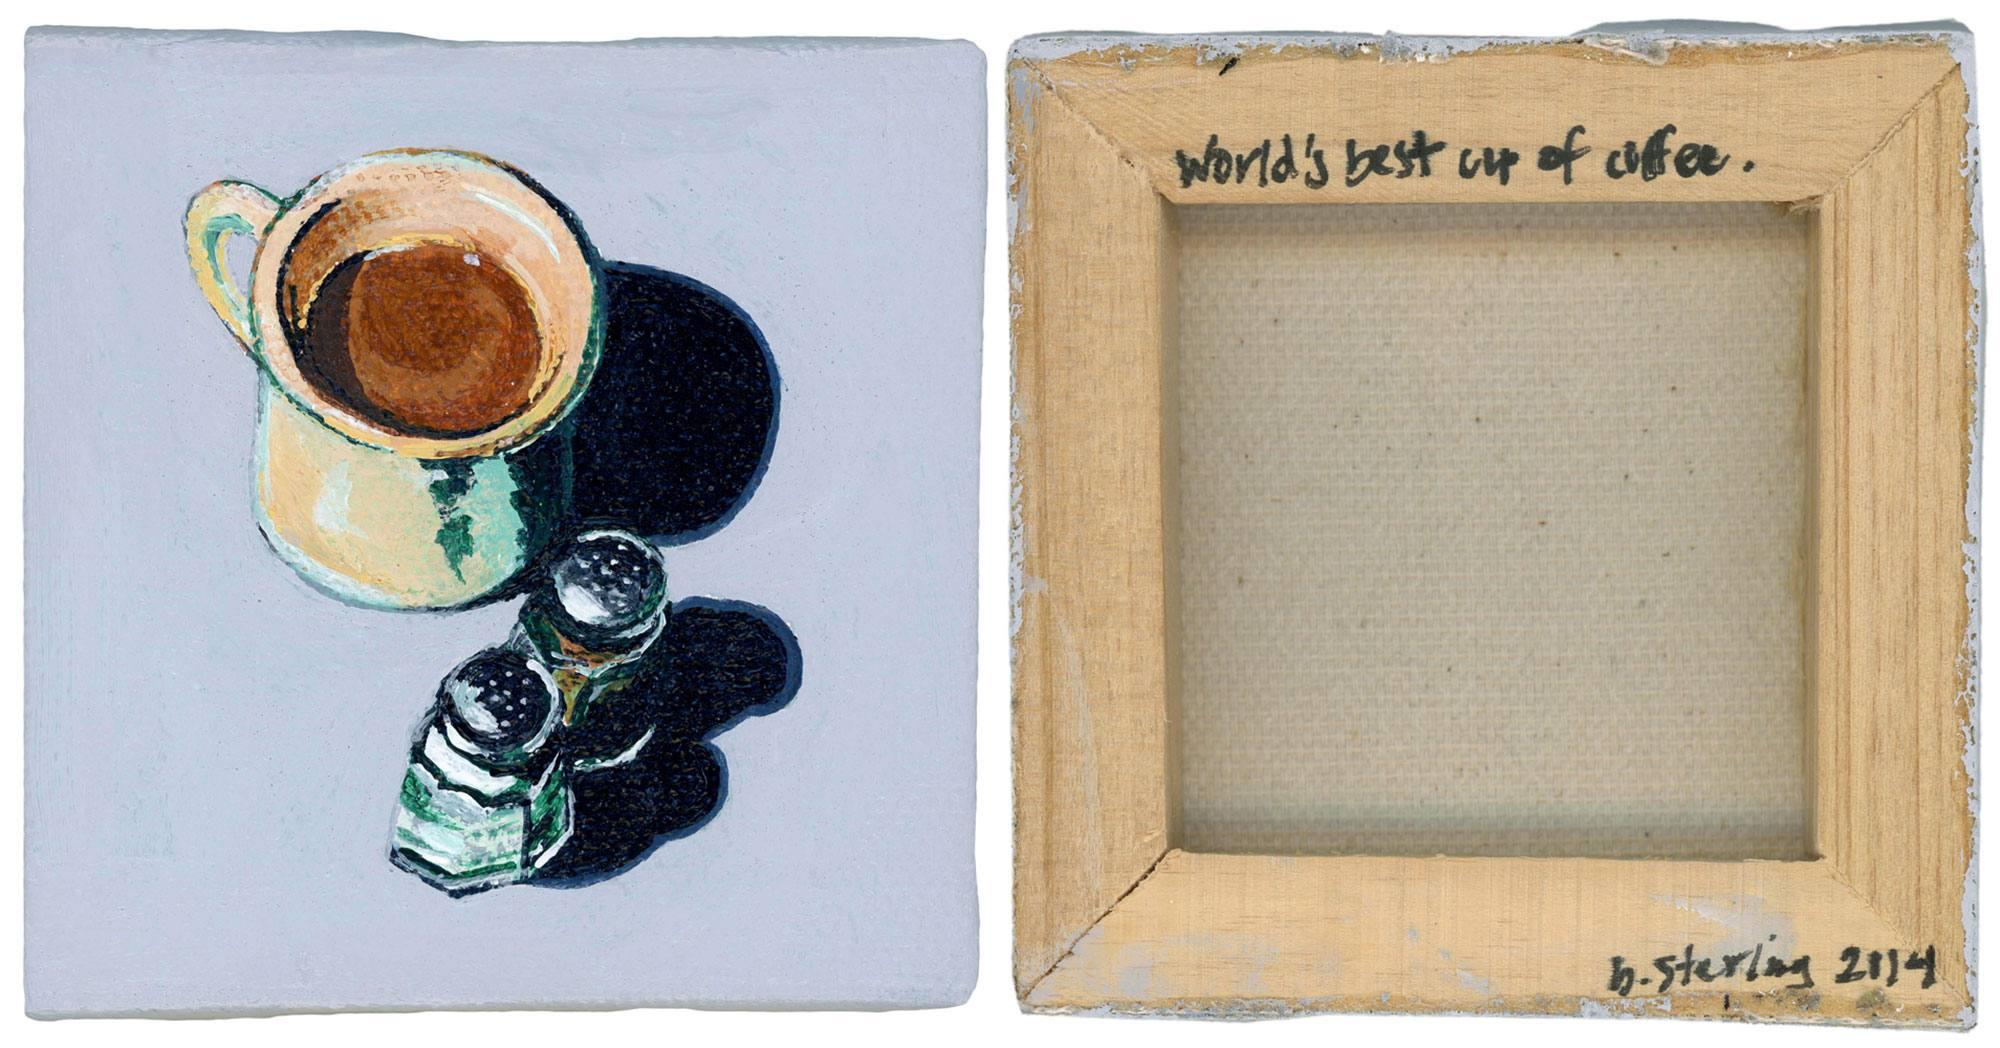 02-cupofcoffee